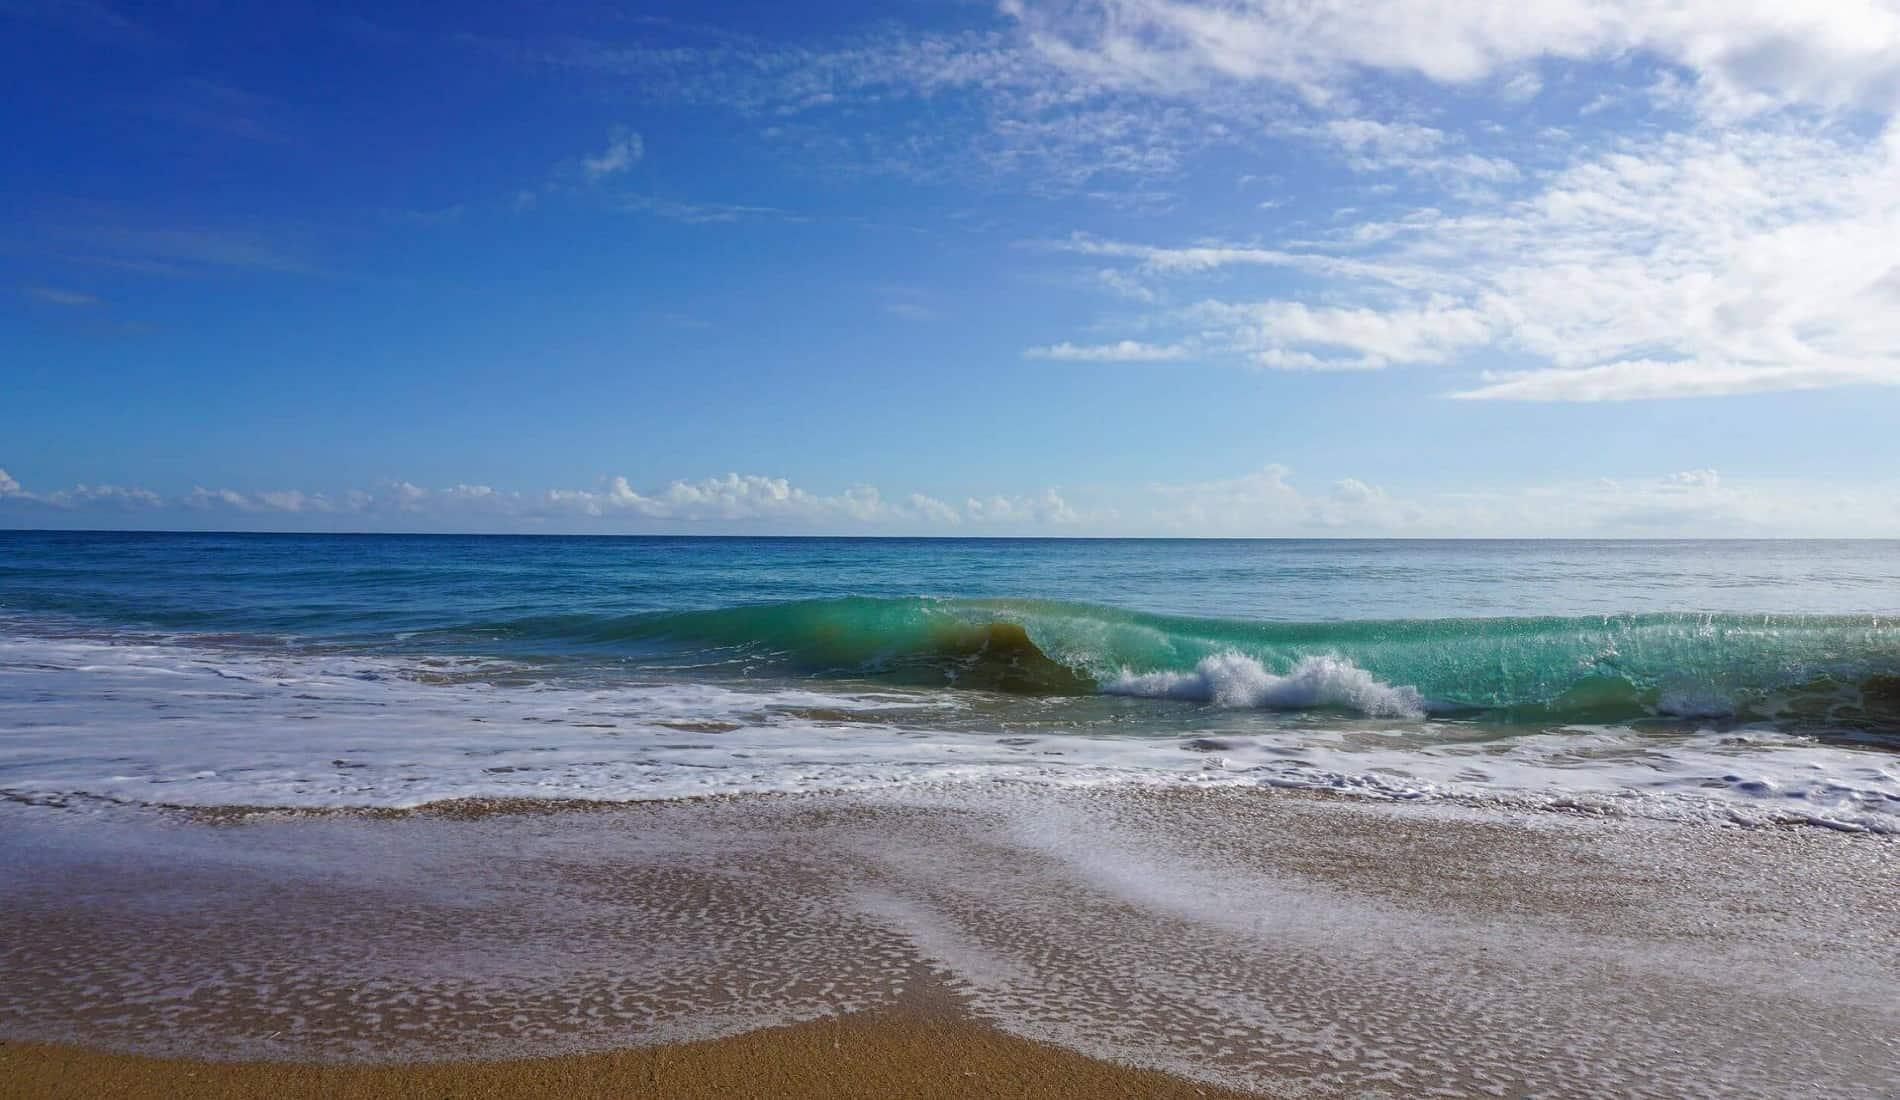 carribean sea (foto van TBH)